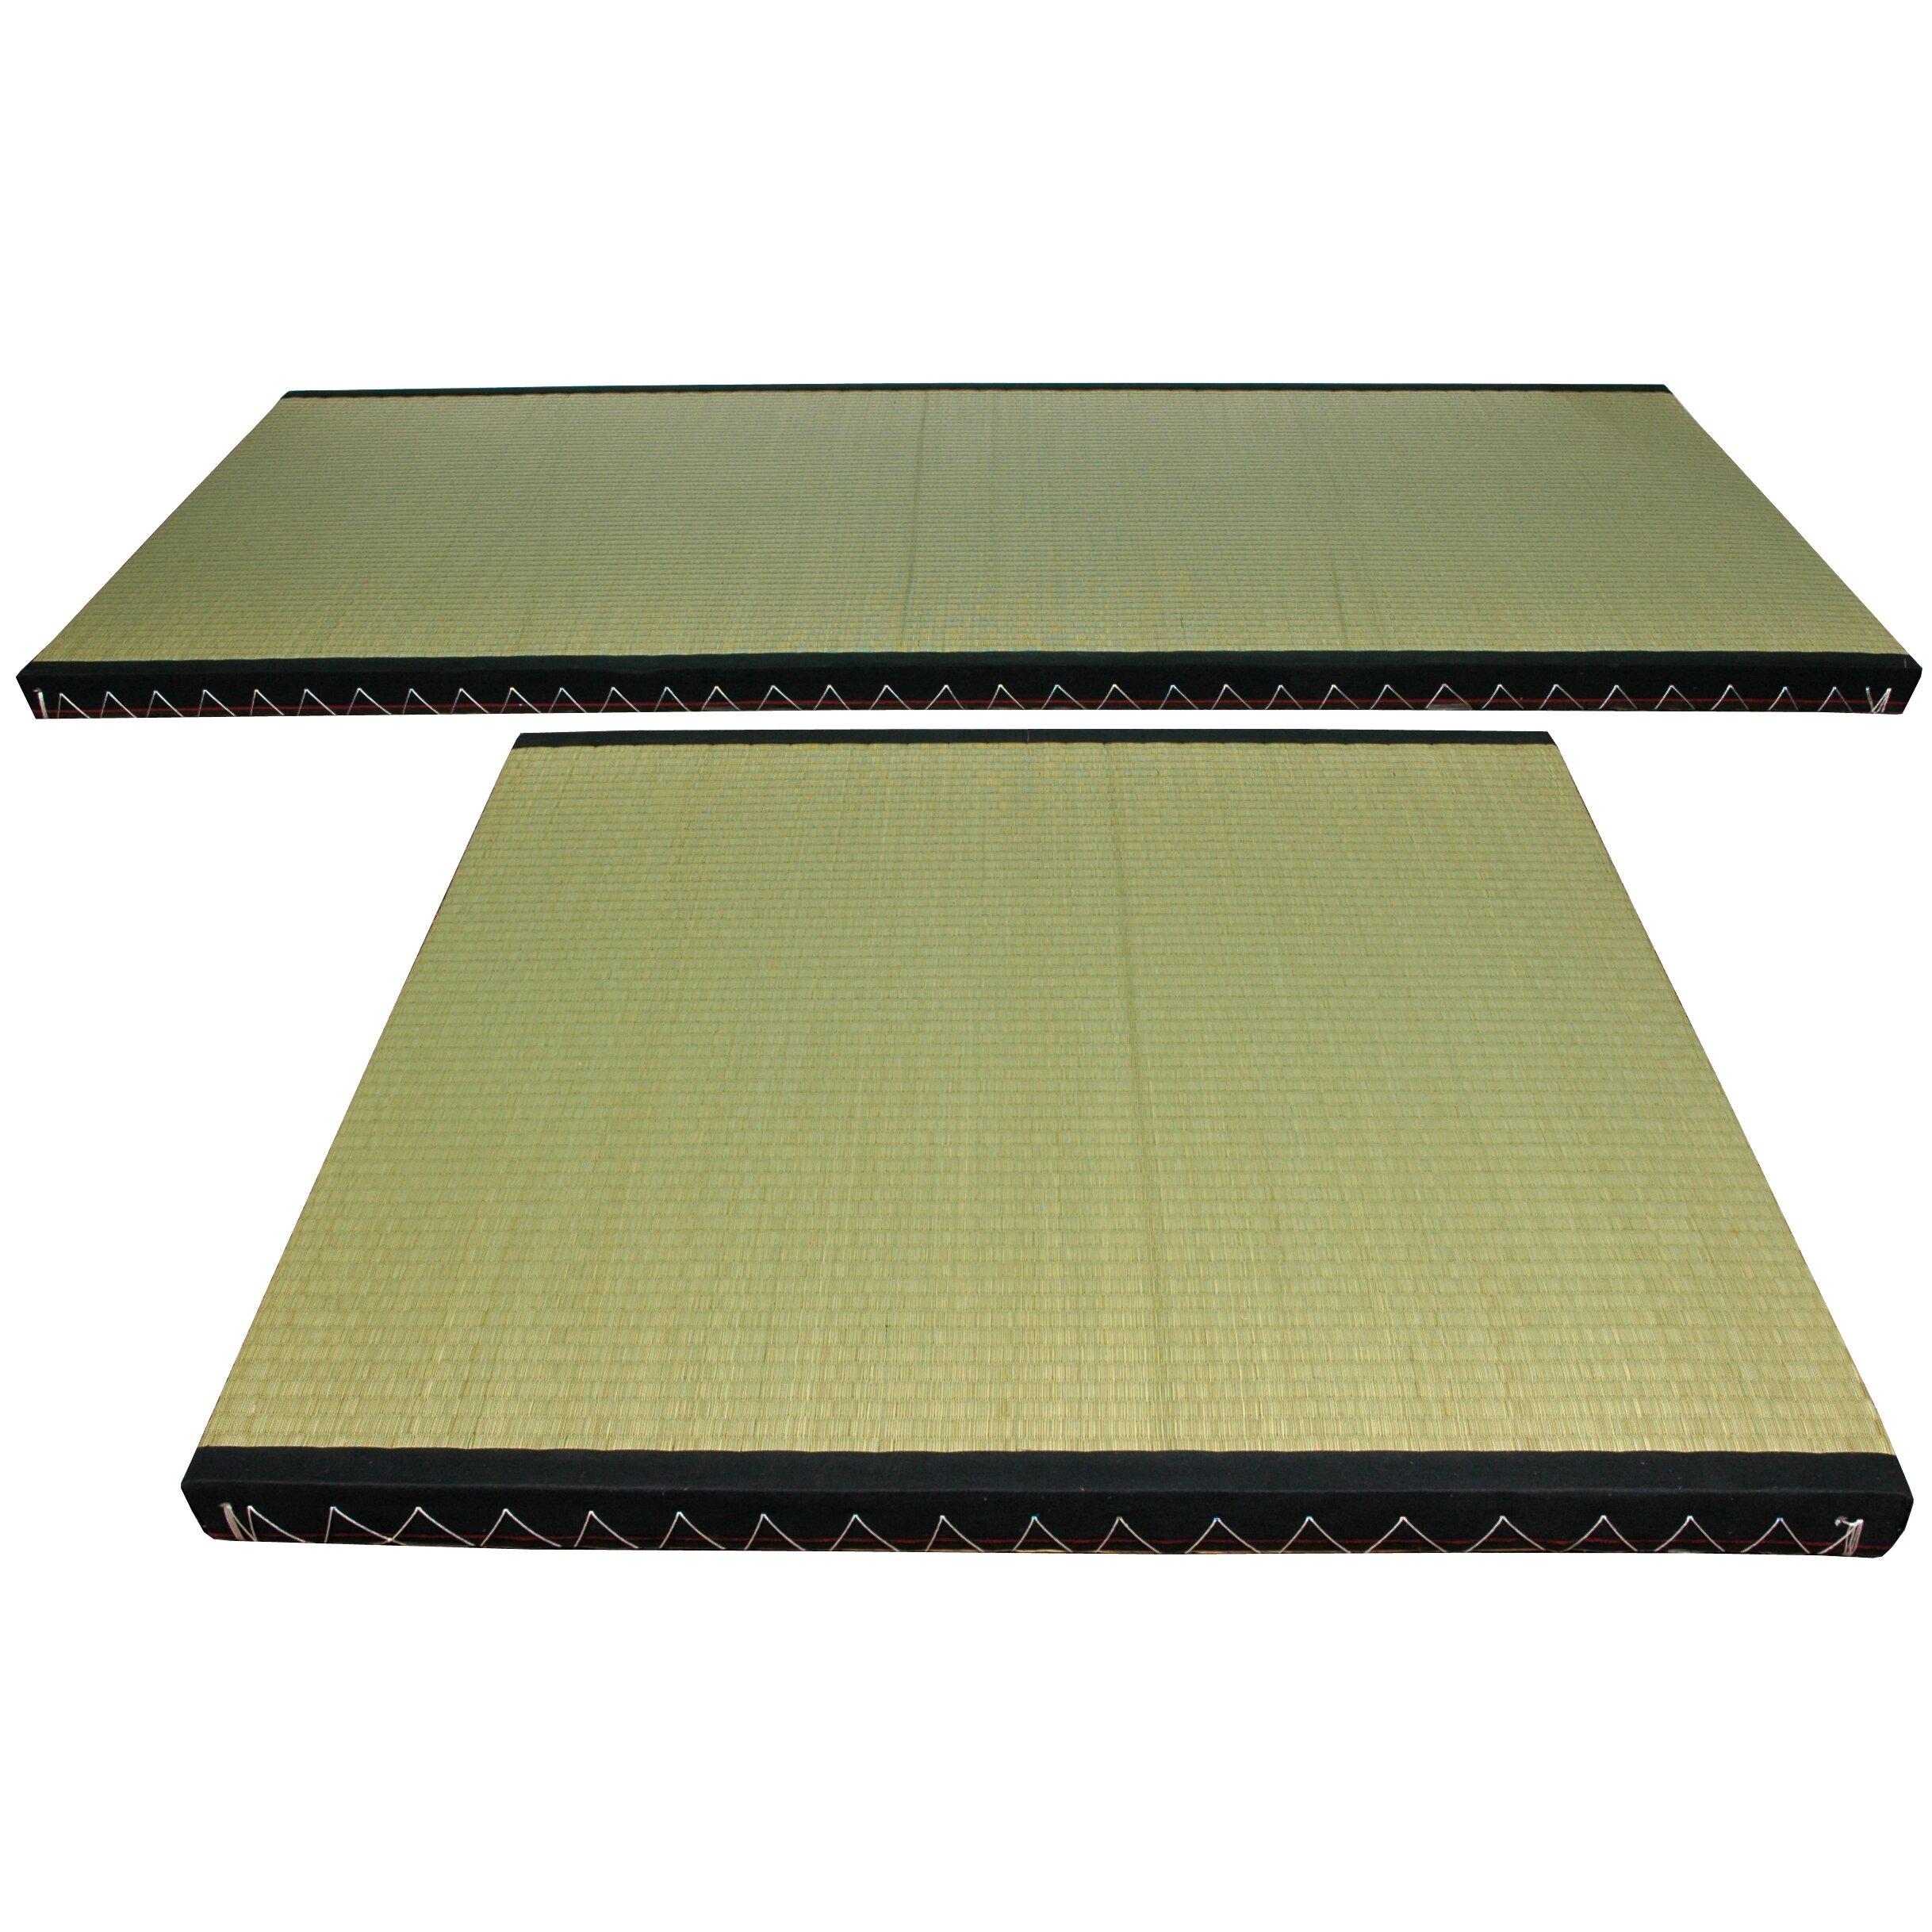 Oriental Furniture Tatami Half Size Mat Amp Reviews Wayfair